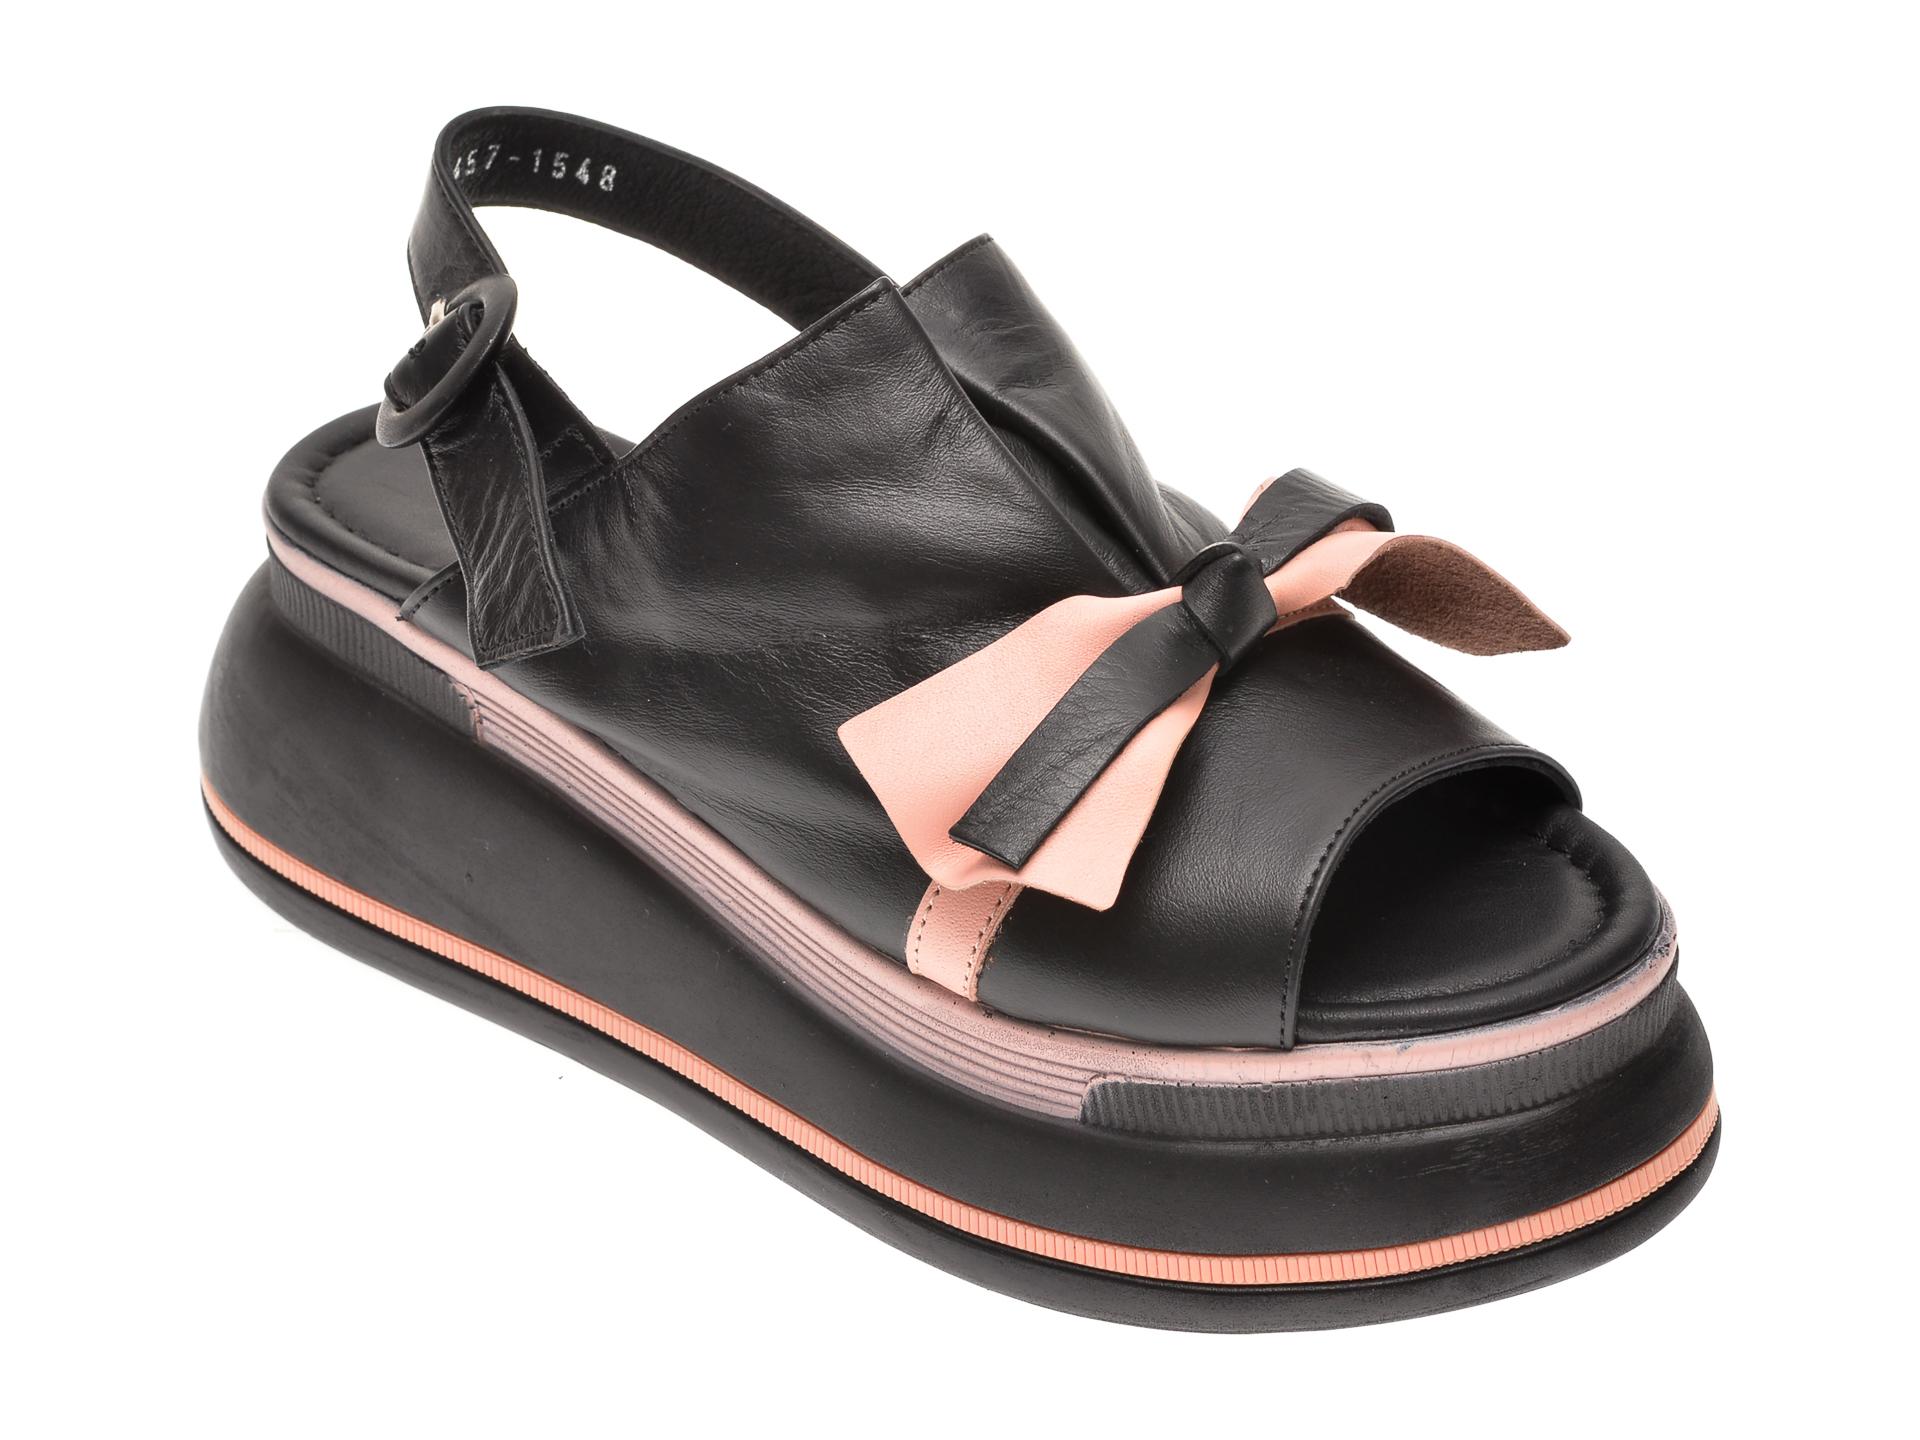 Sandale MISS LIZA negre, 1182457, din piele naturala